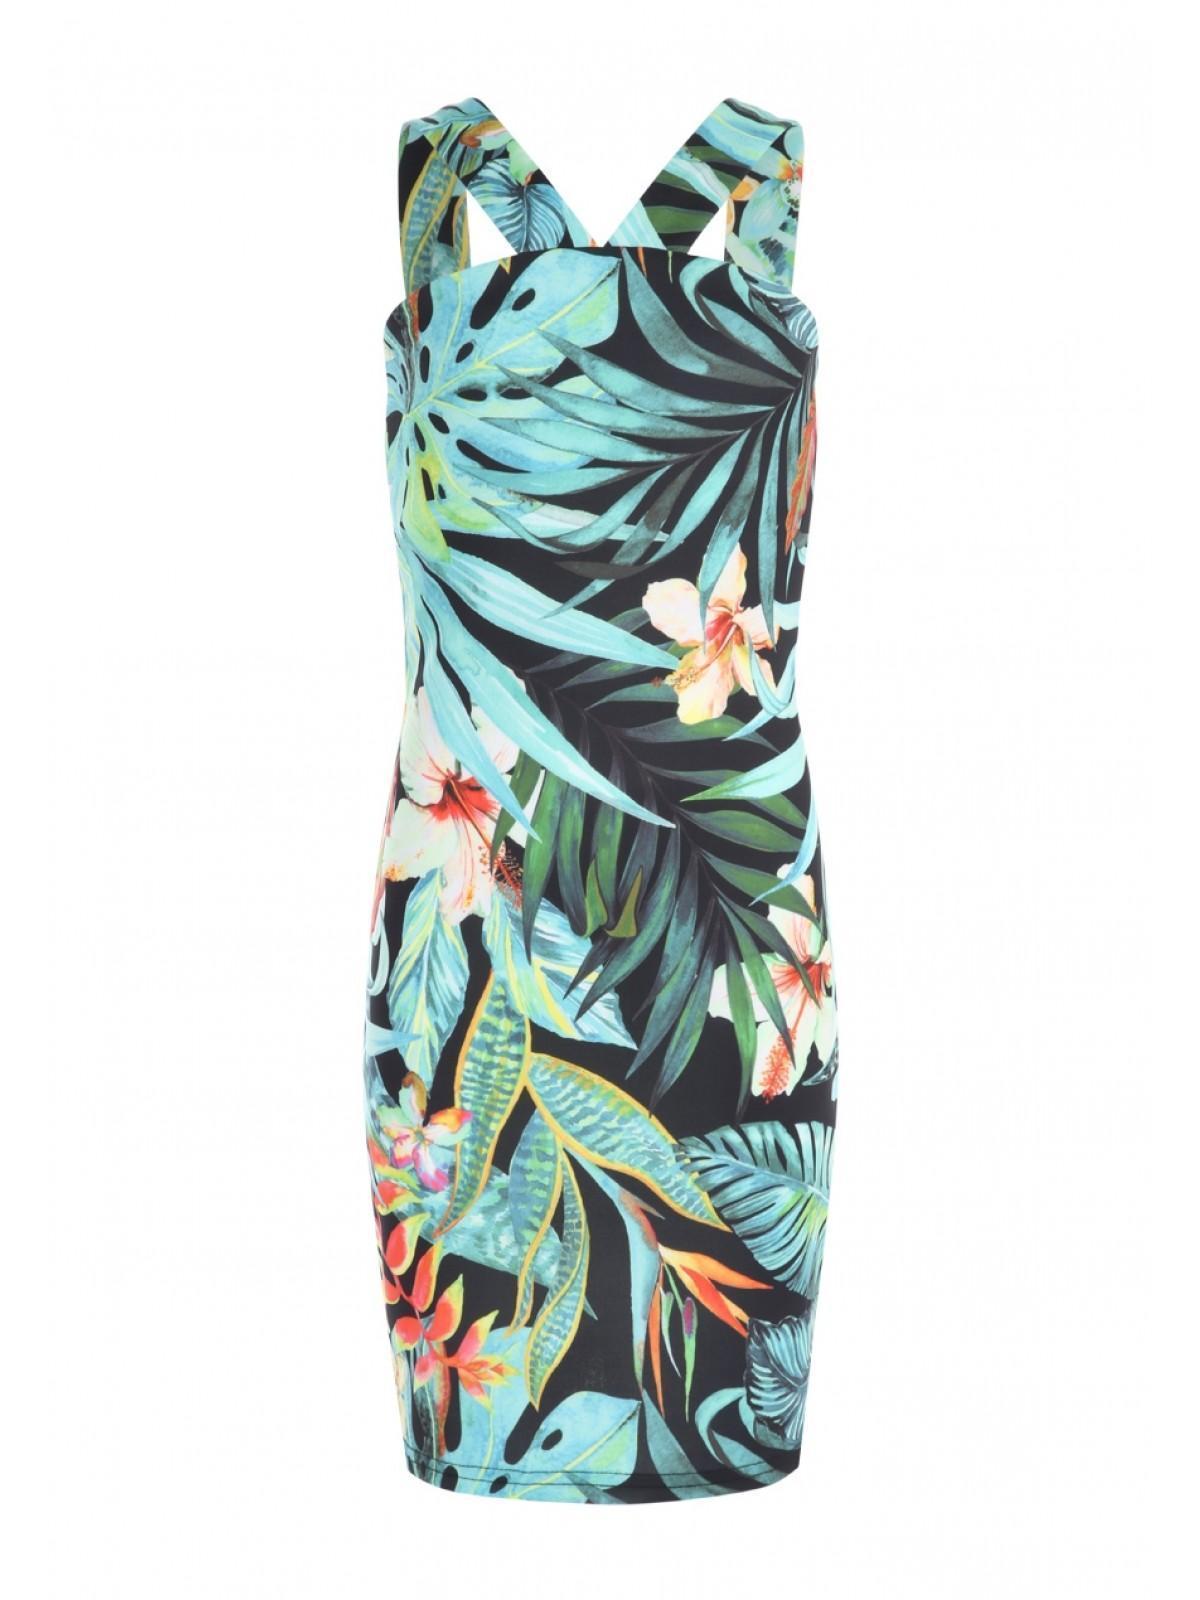 863de8e8f Girls Older Girls Palm Tree Printed Cross Front Sophie Dress